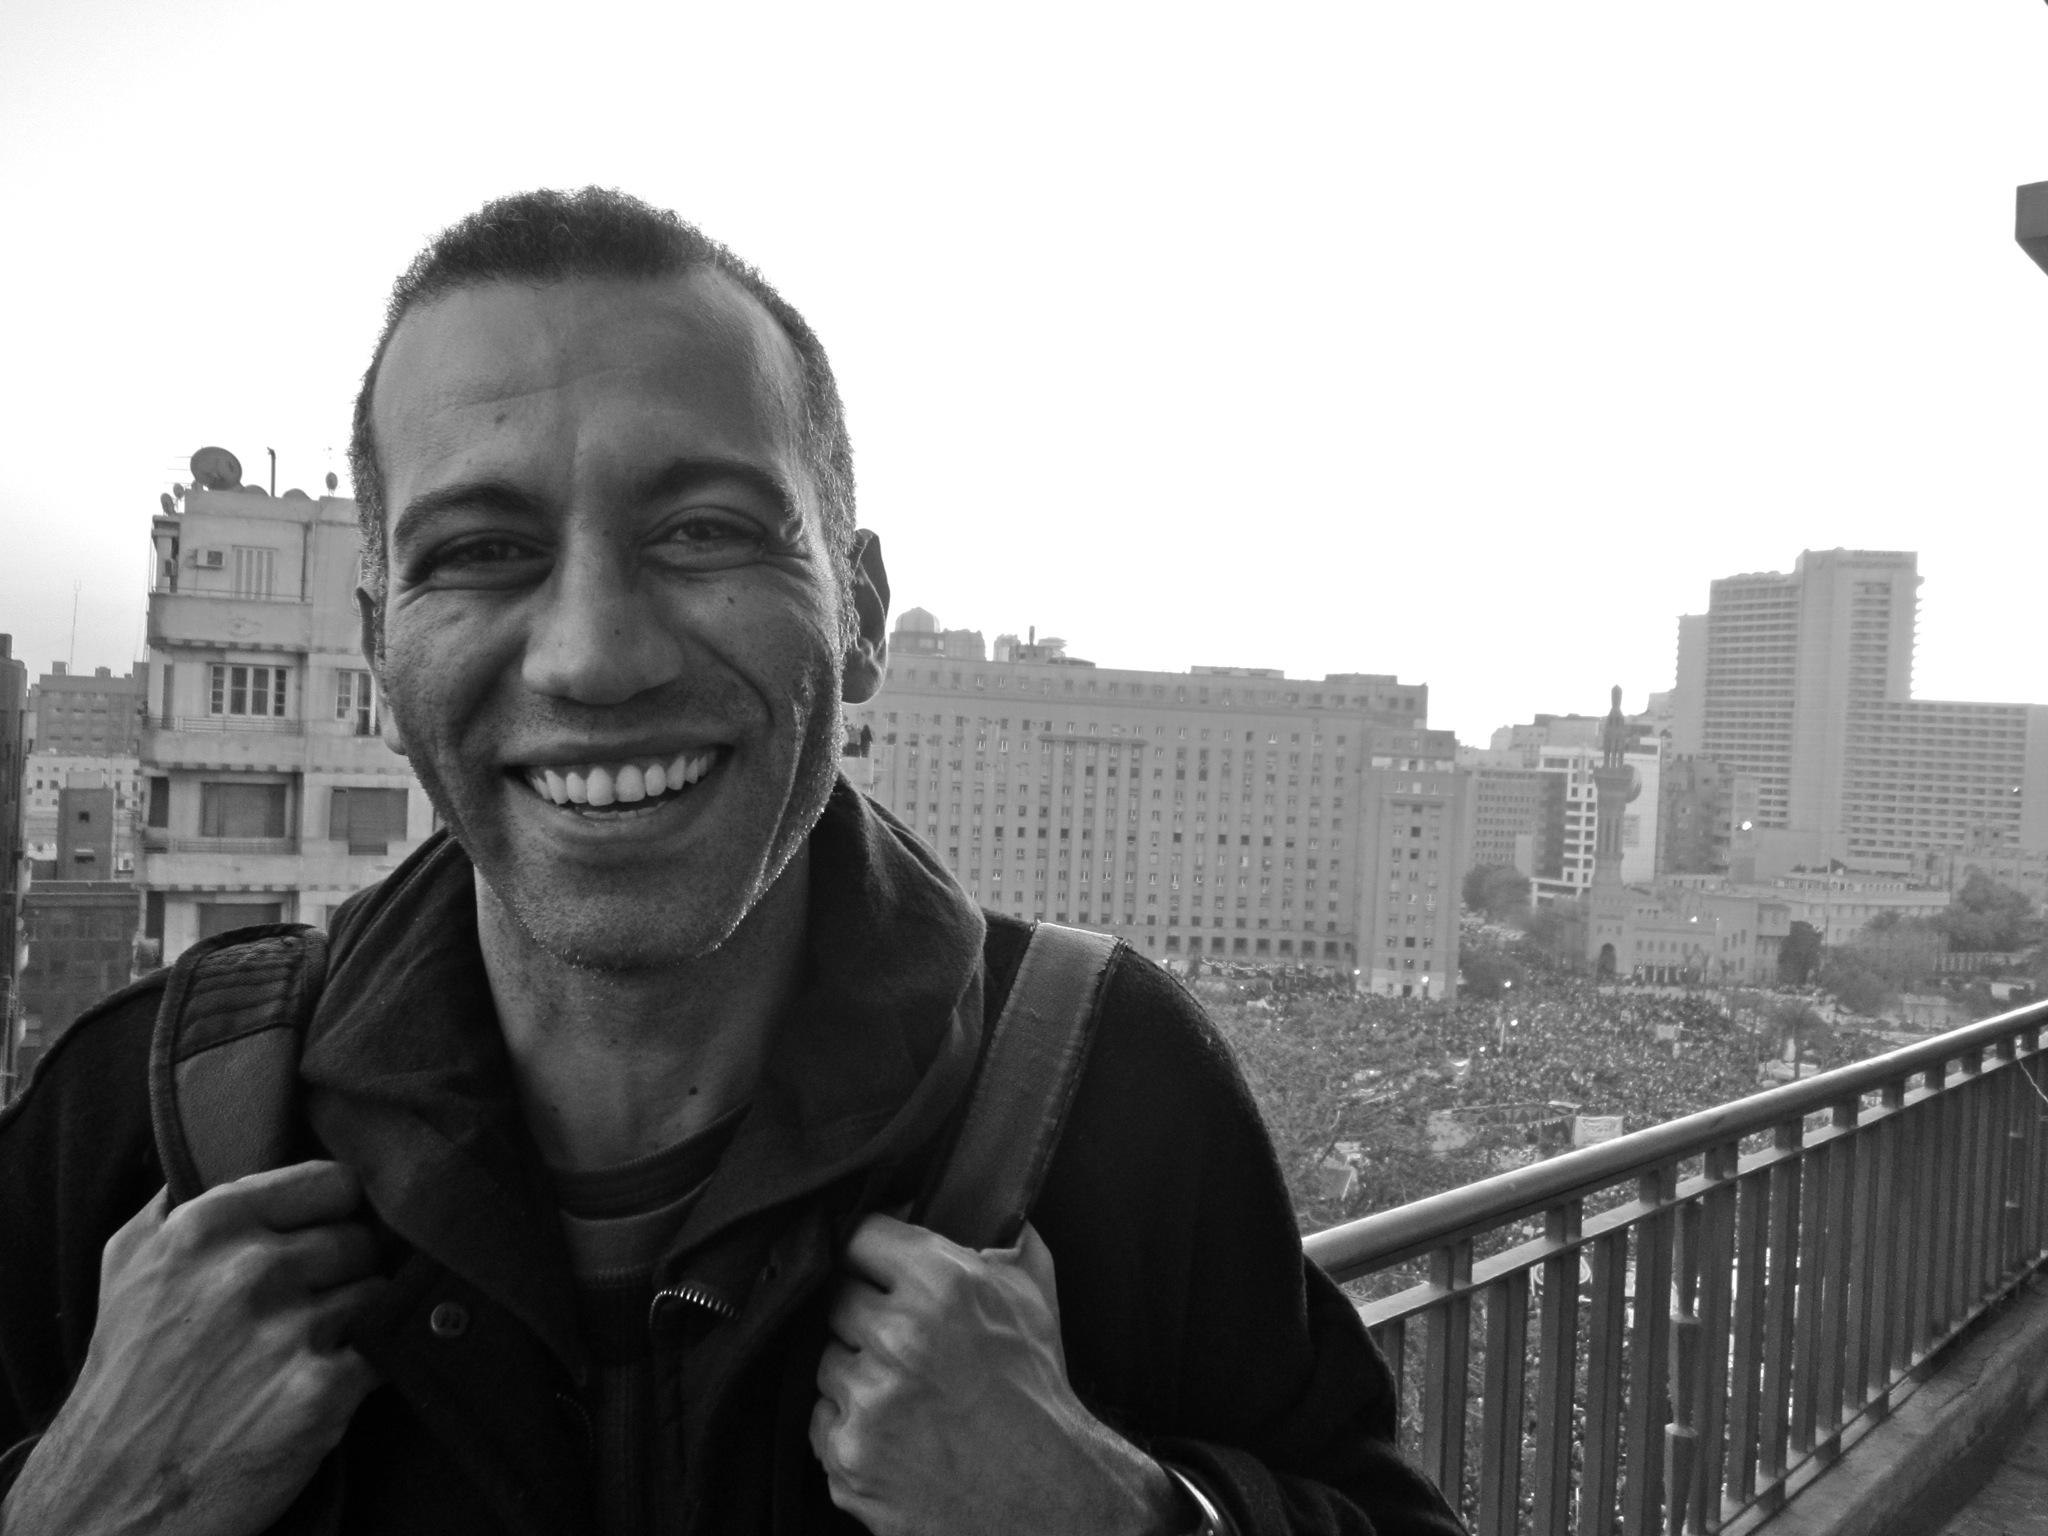 Hossam_El-Hamalawy_@_Tahrir_Square